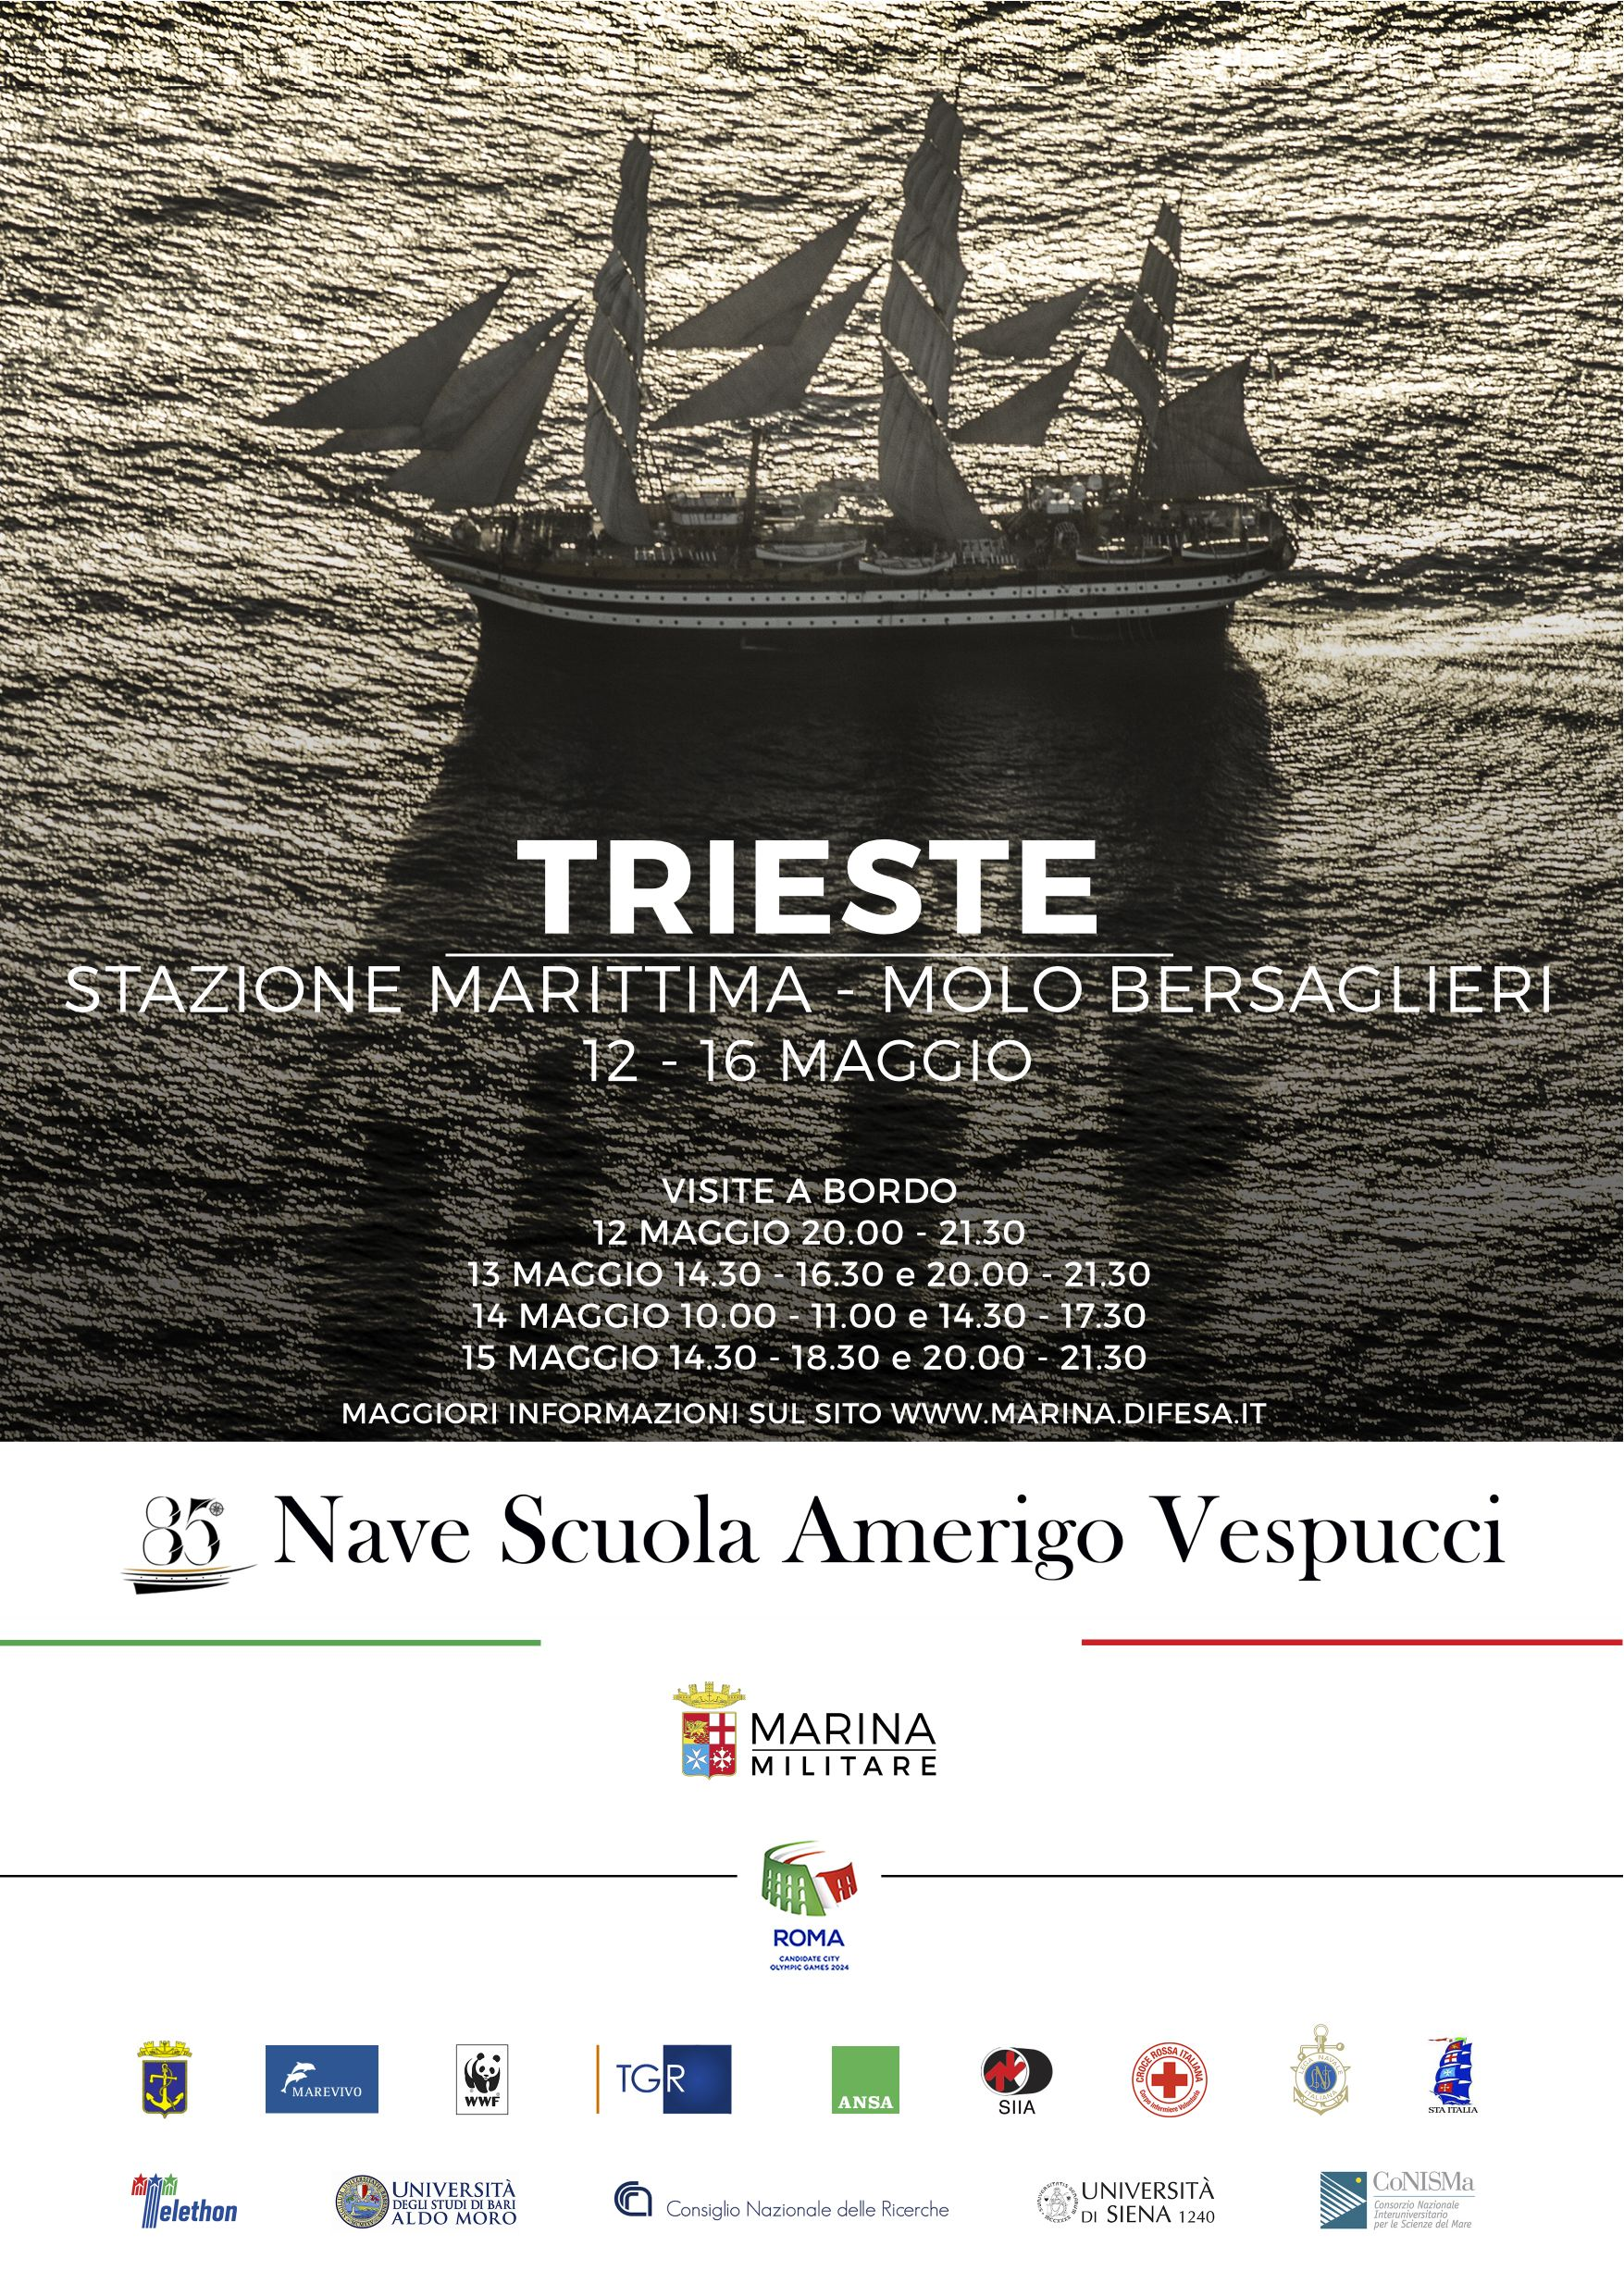 Vespucci locandina TRIESTE